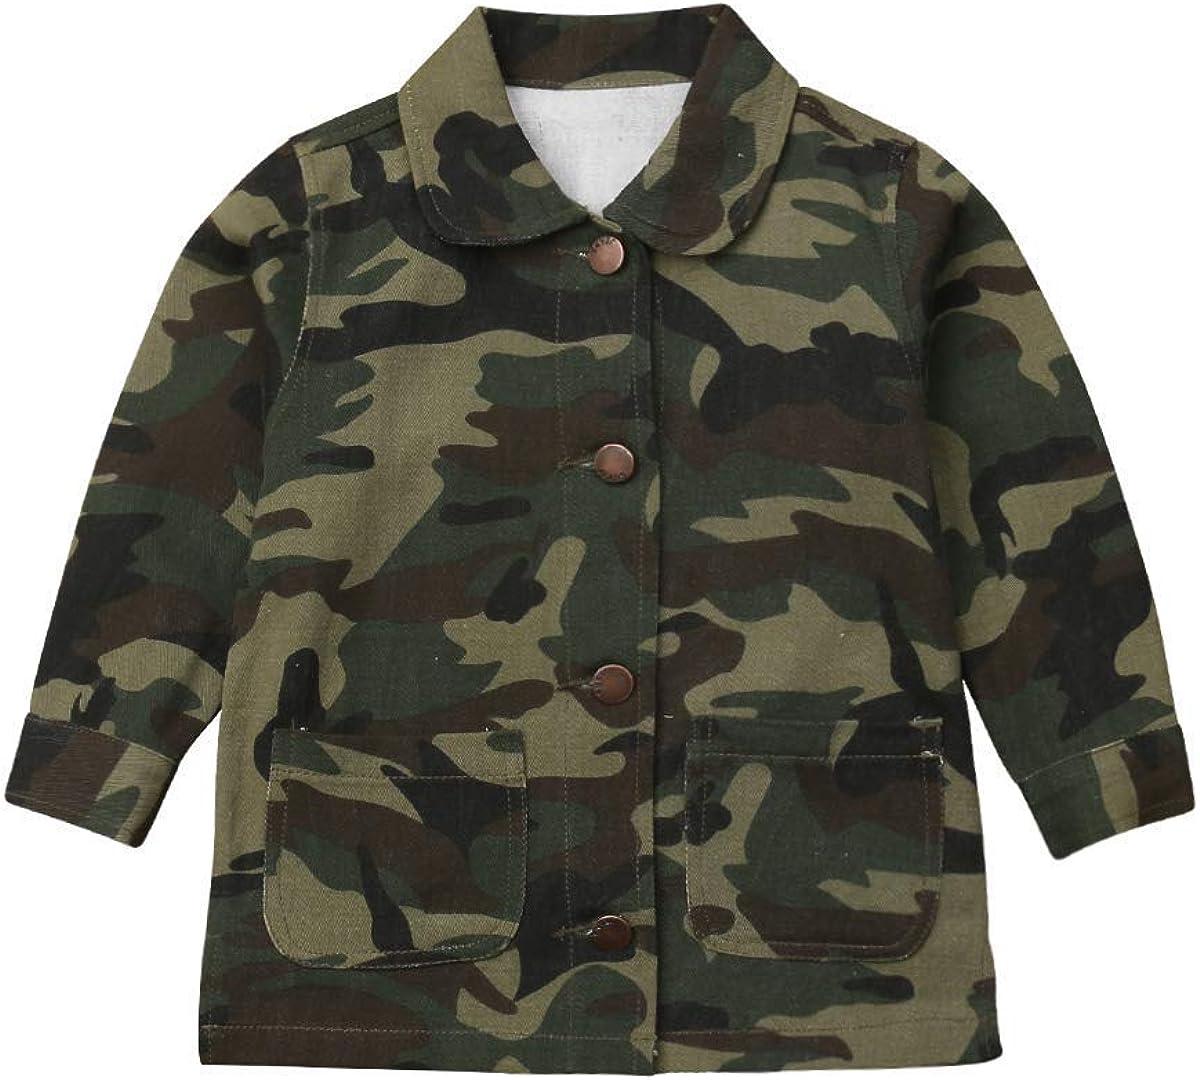 Toddler Little Girl Translated Camouflage Jacket Coat Bu Heart Letter Print Many popular brands